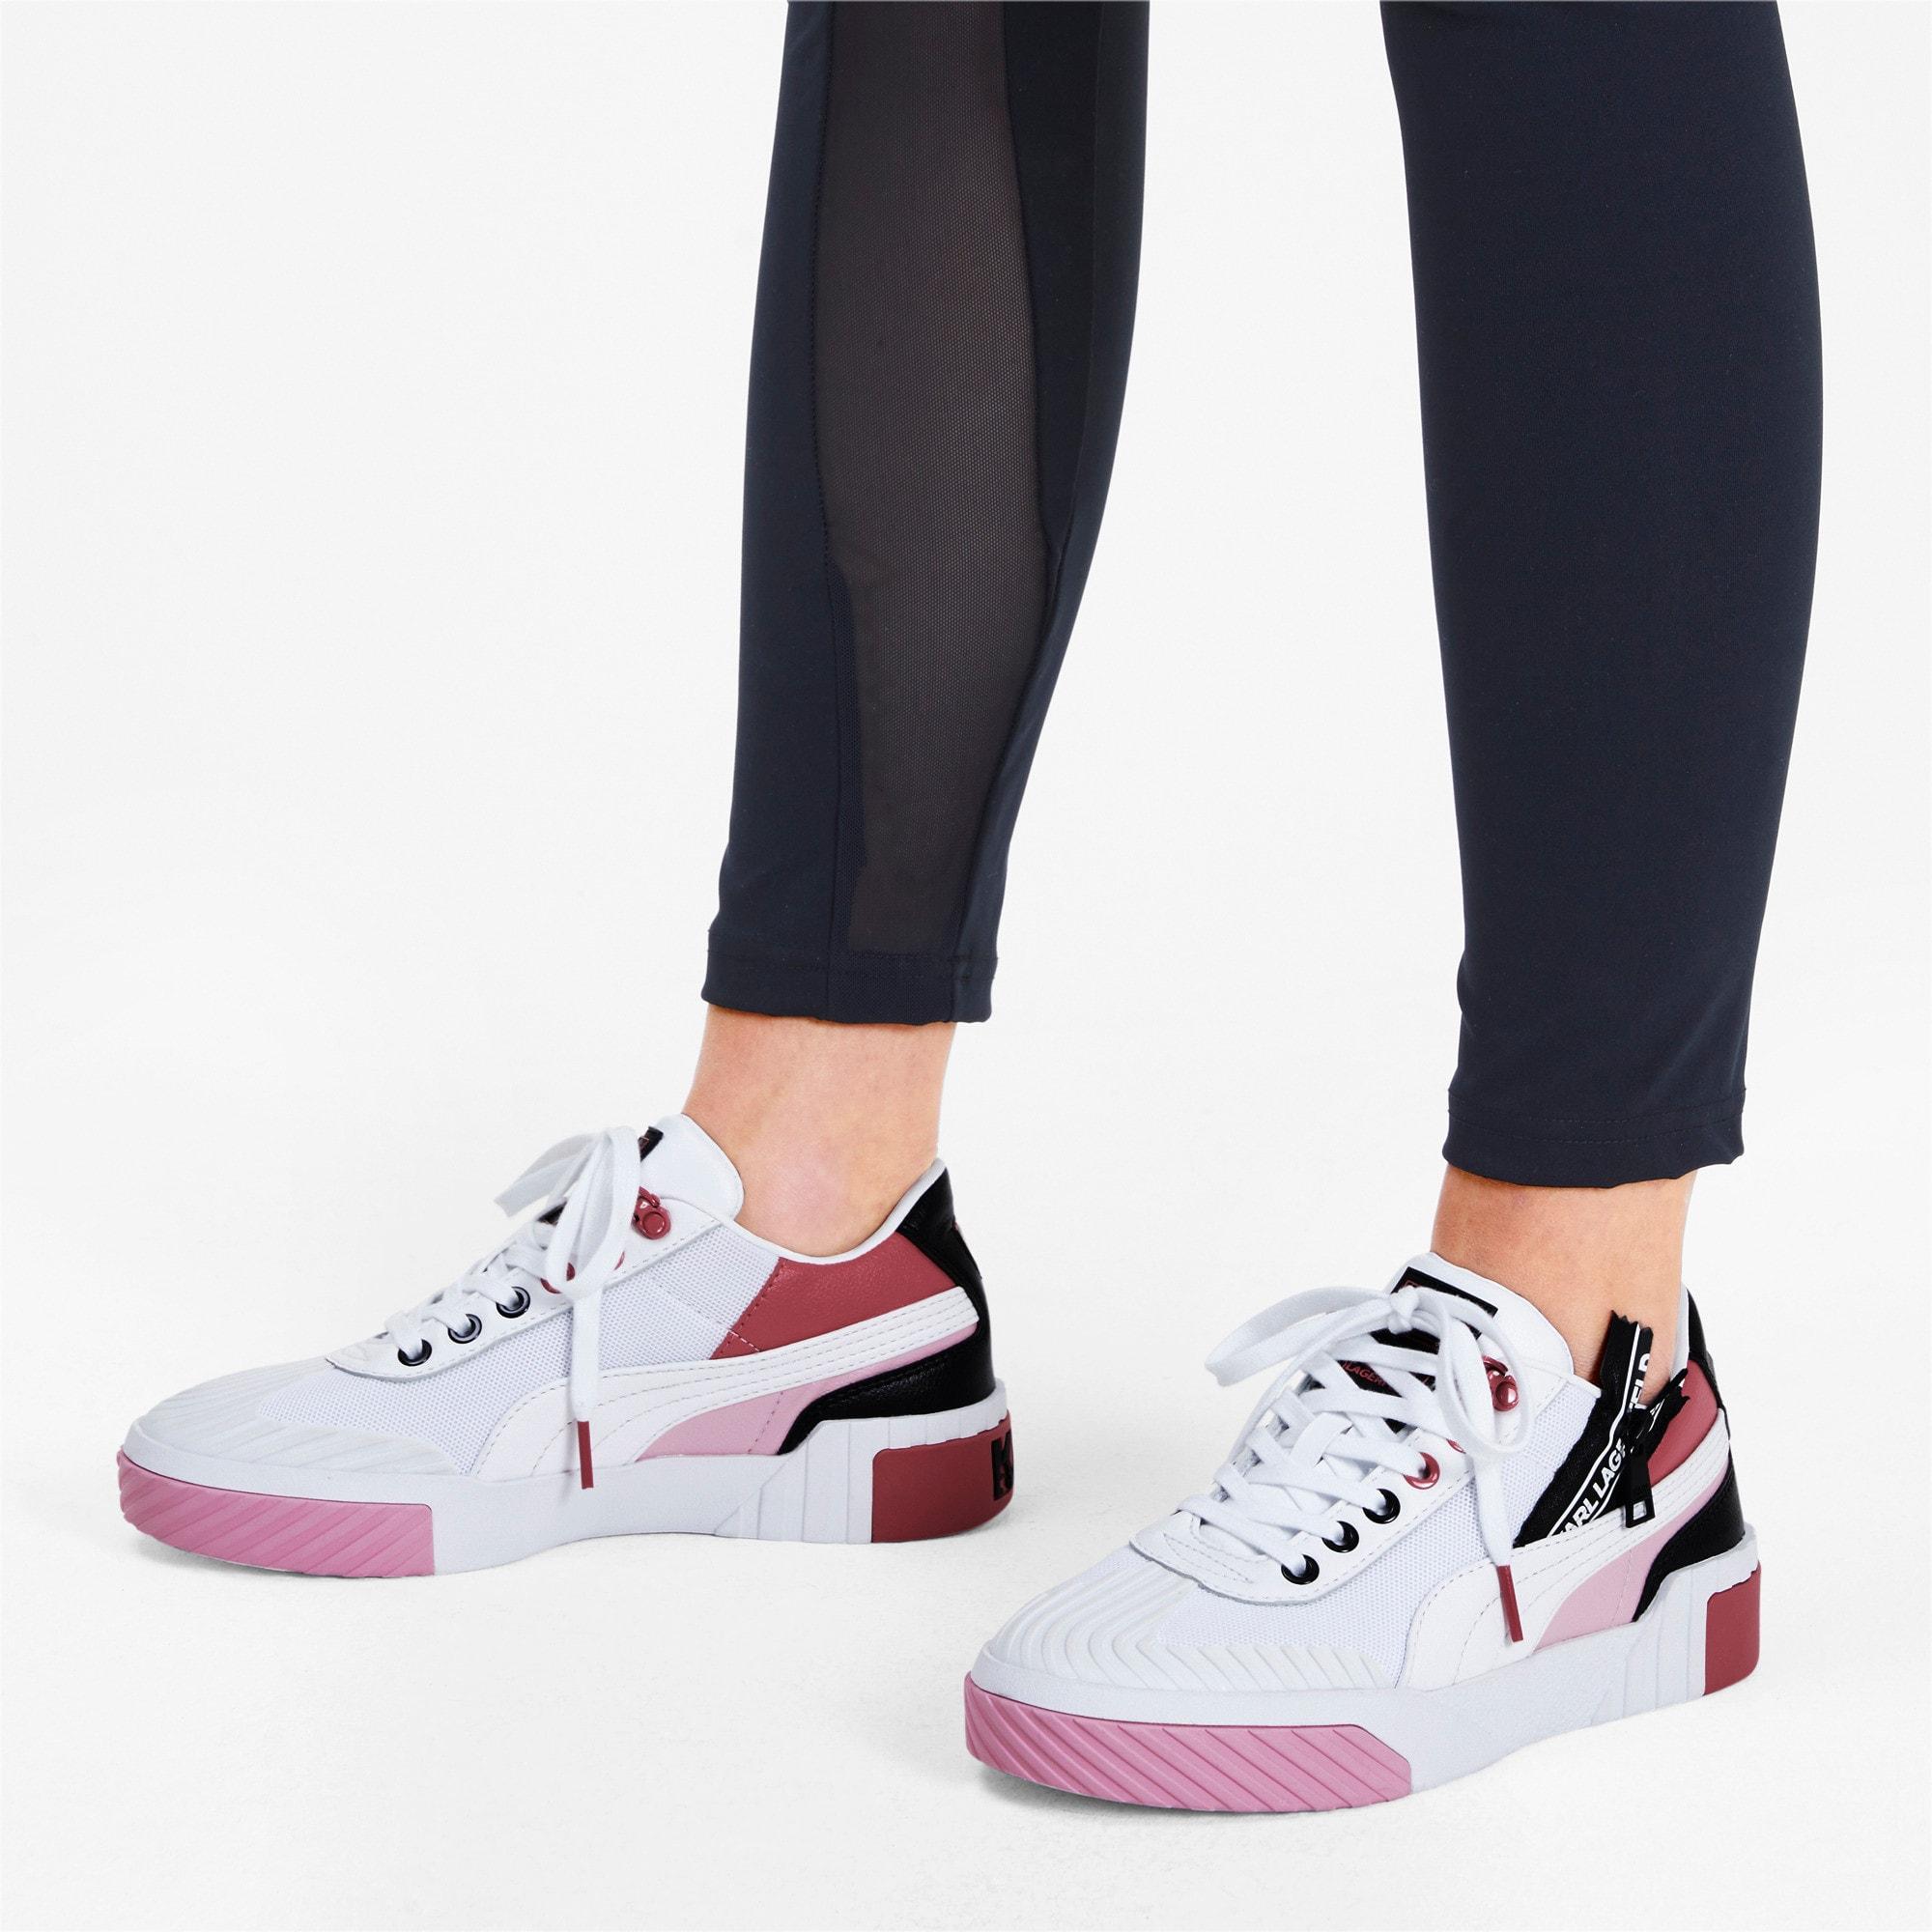 Thumbnail 2 of PUMA x KARL LAGERFELD Cali Women's Training Shoes, Puma White-PRISM PINK, medium